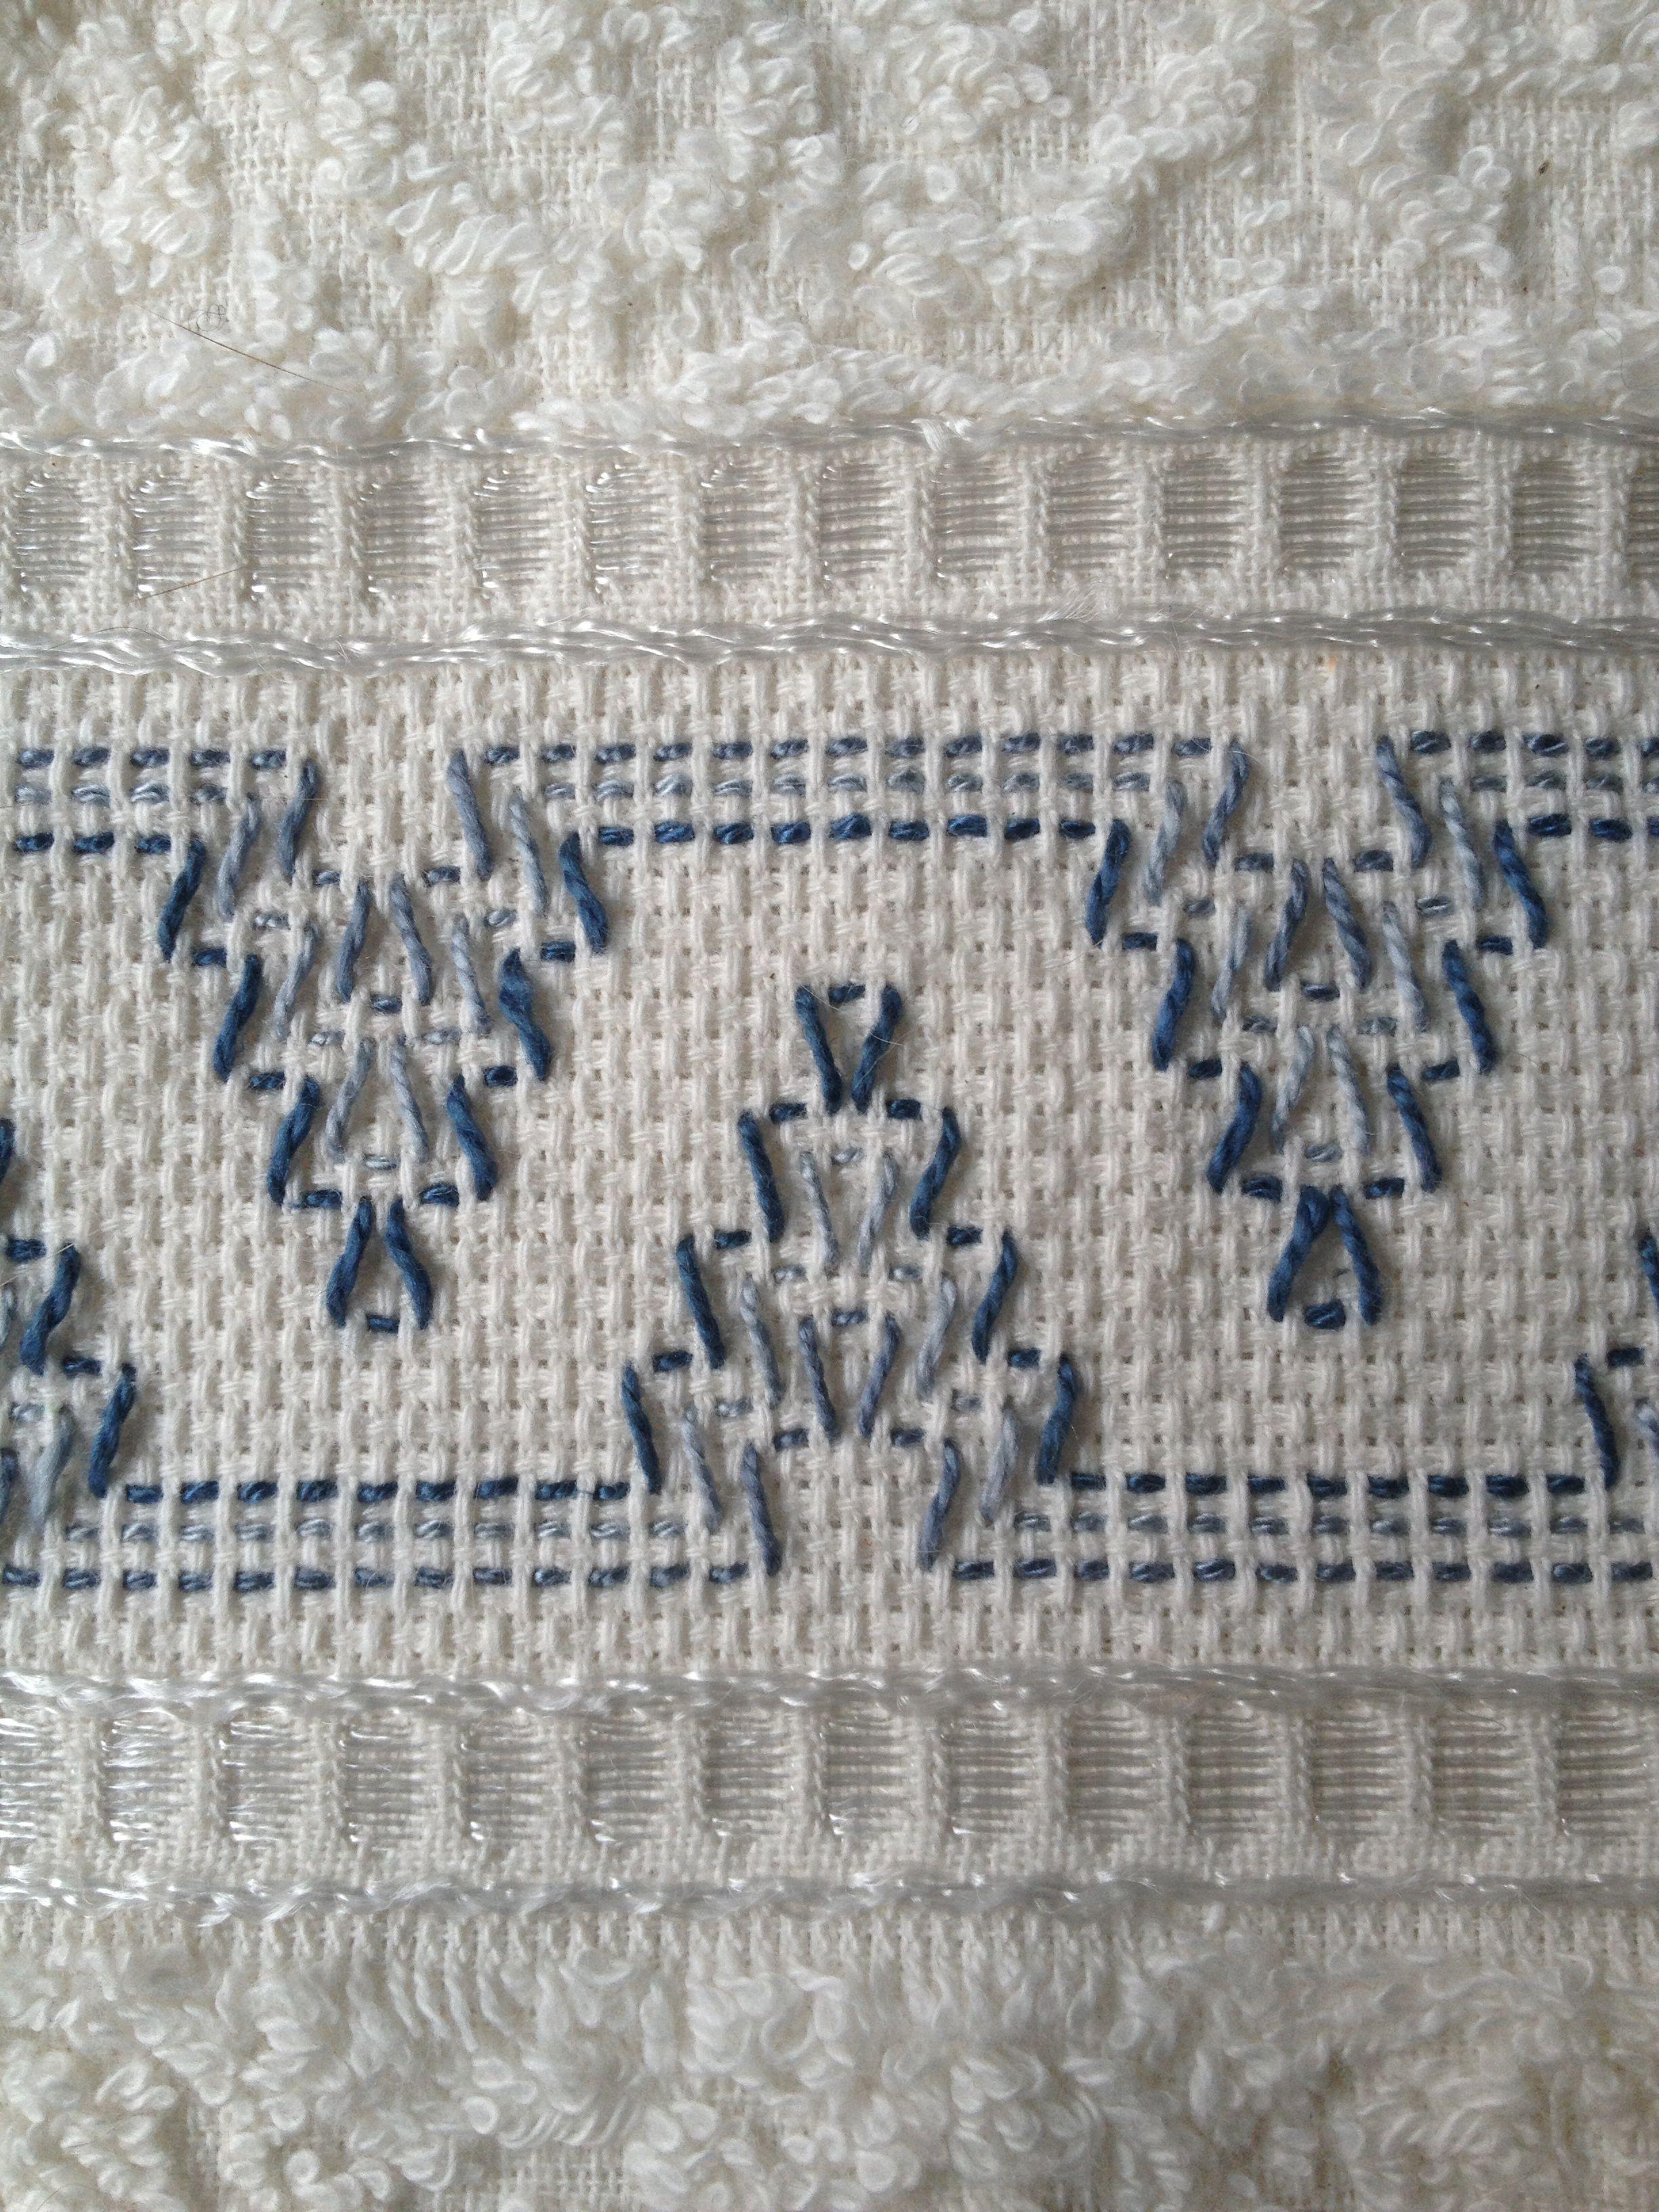 Swedish Huck embroidery on a hand towel. | Punto filza | Pinterest ...